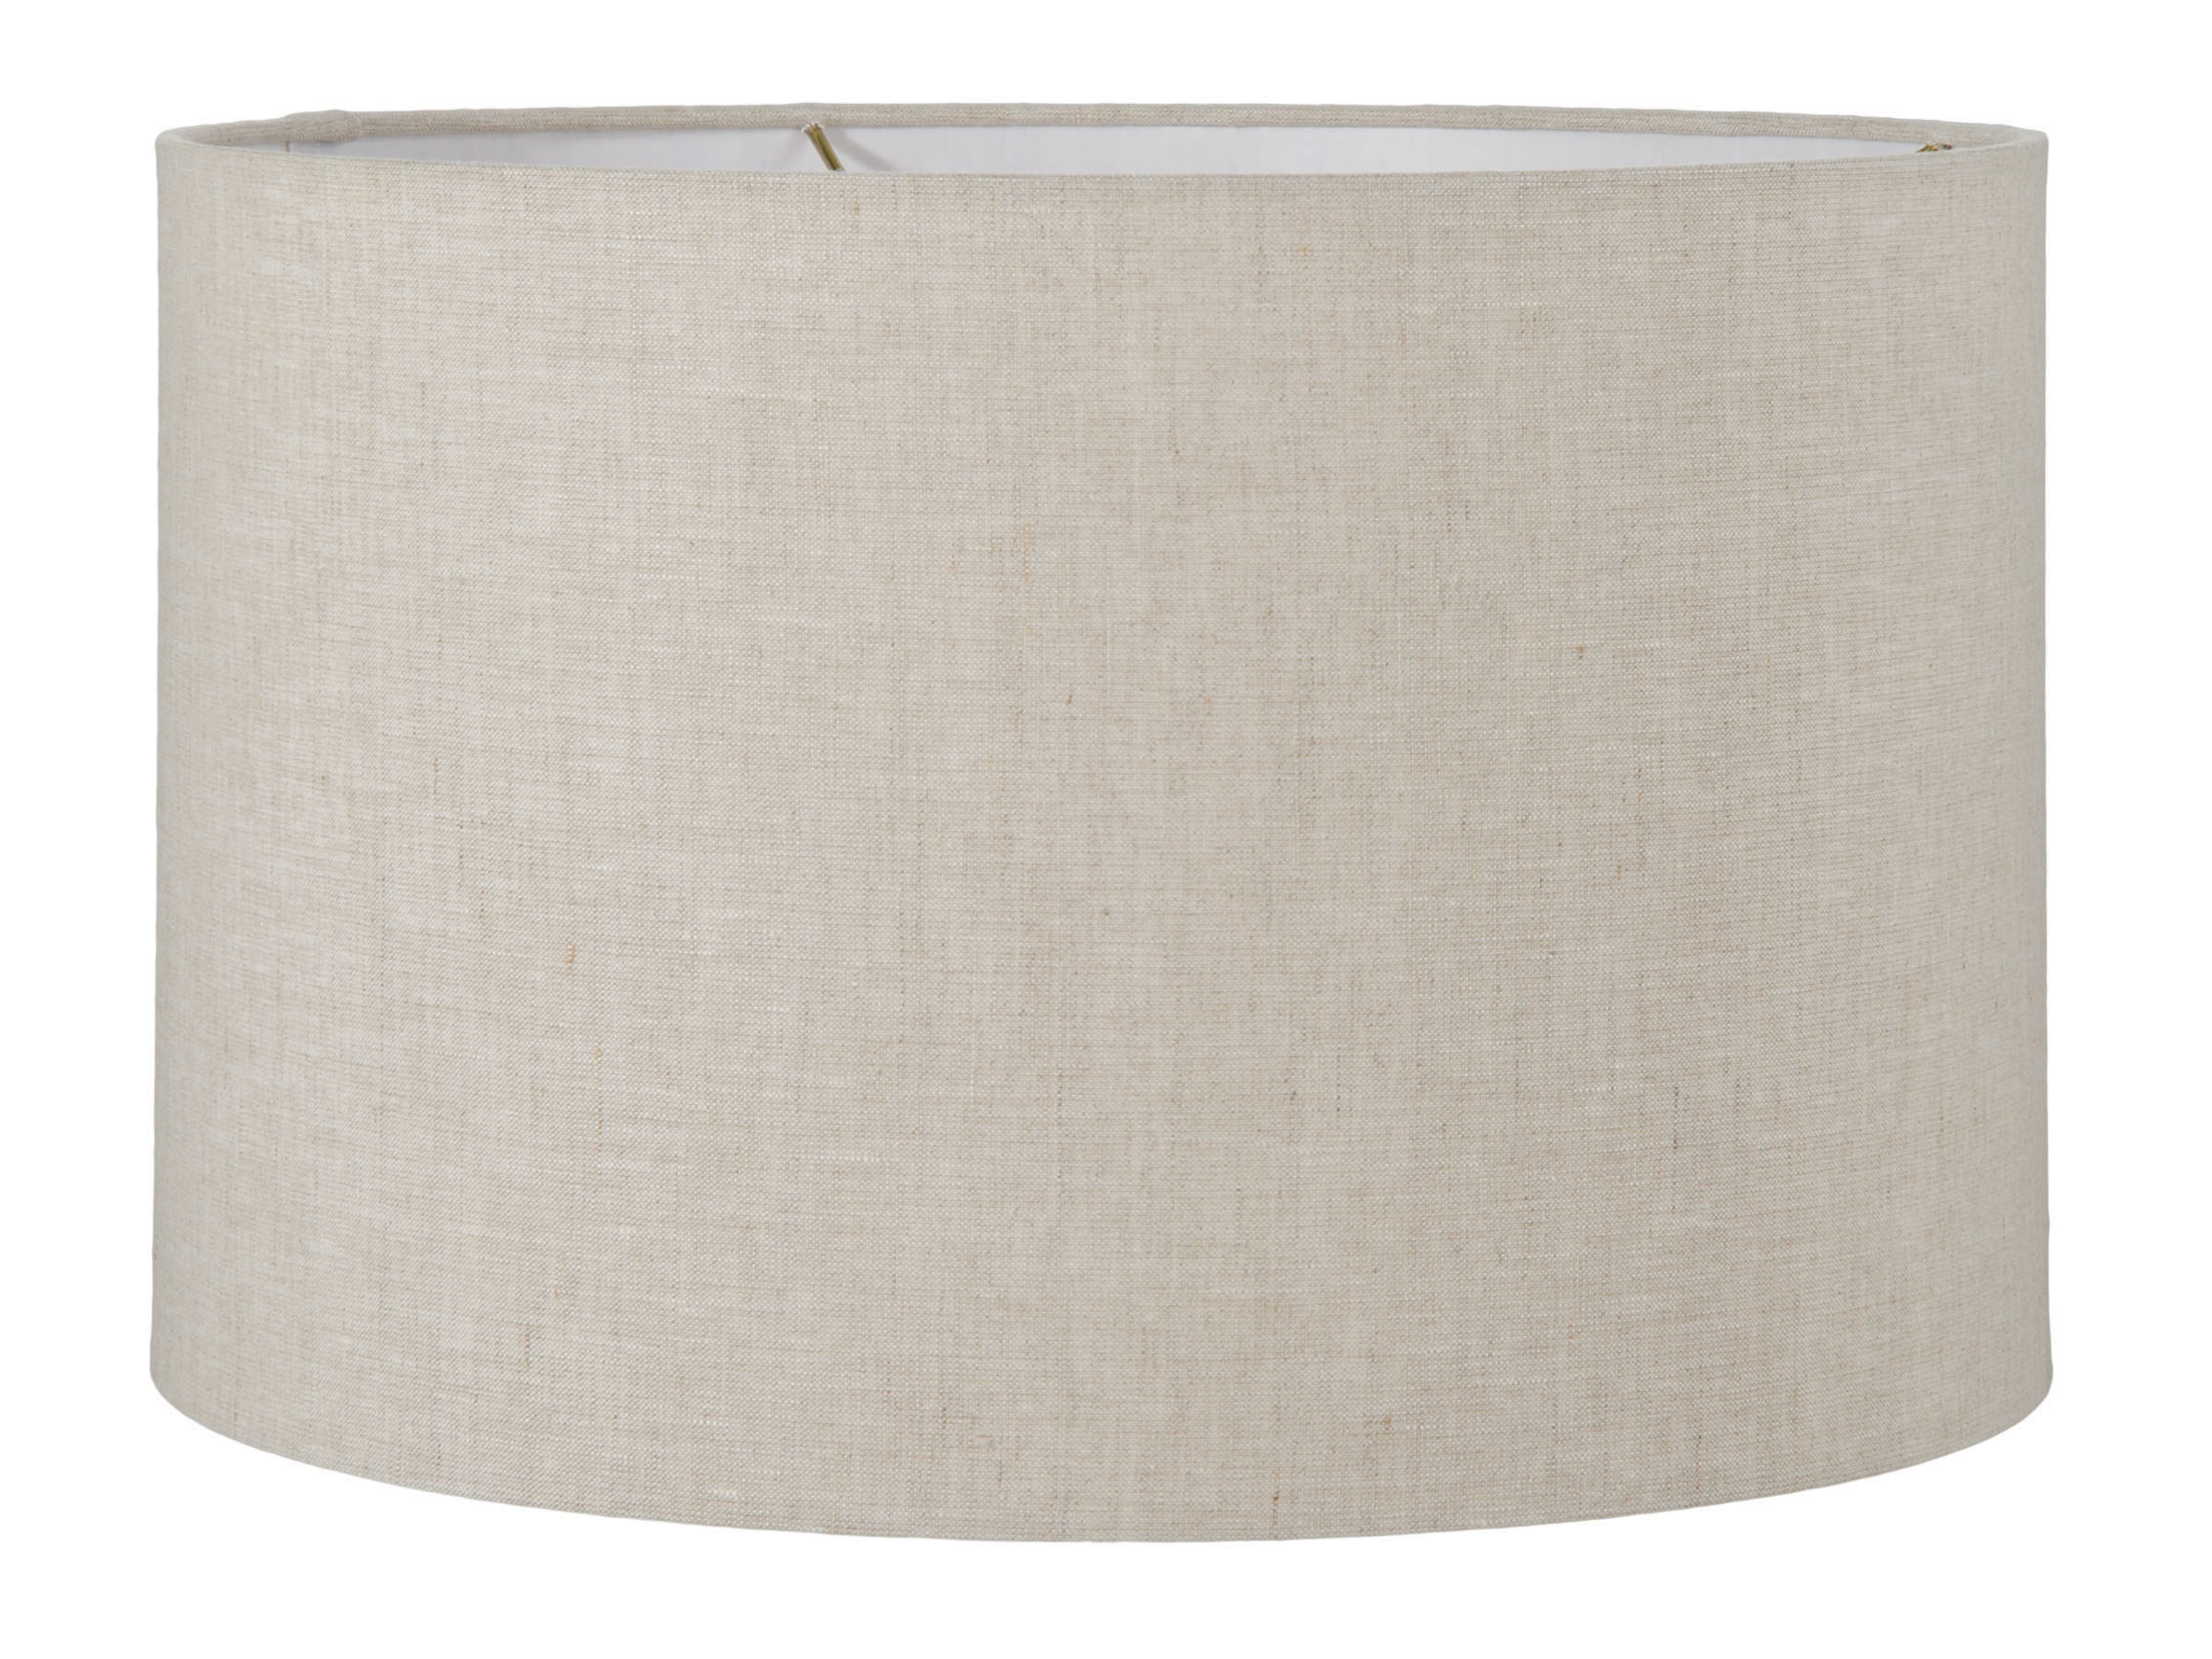 Natural Linen Drum Lampshade 05641a B Amp P Lamp Supply